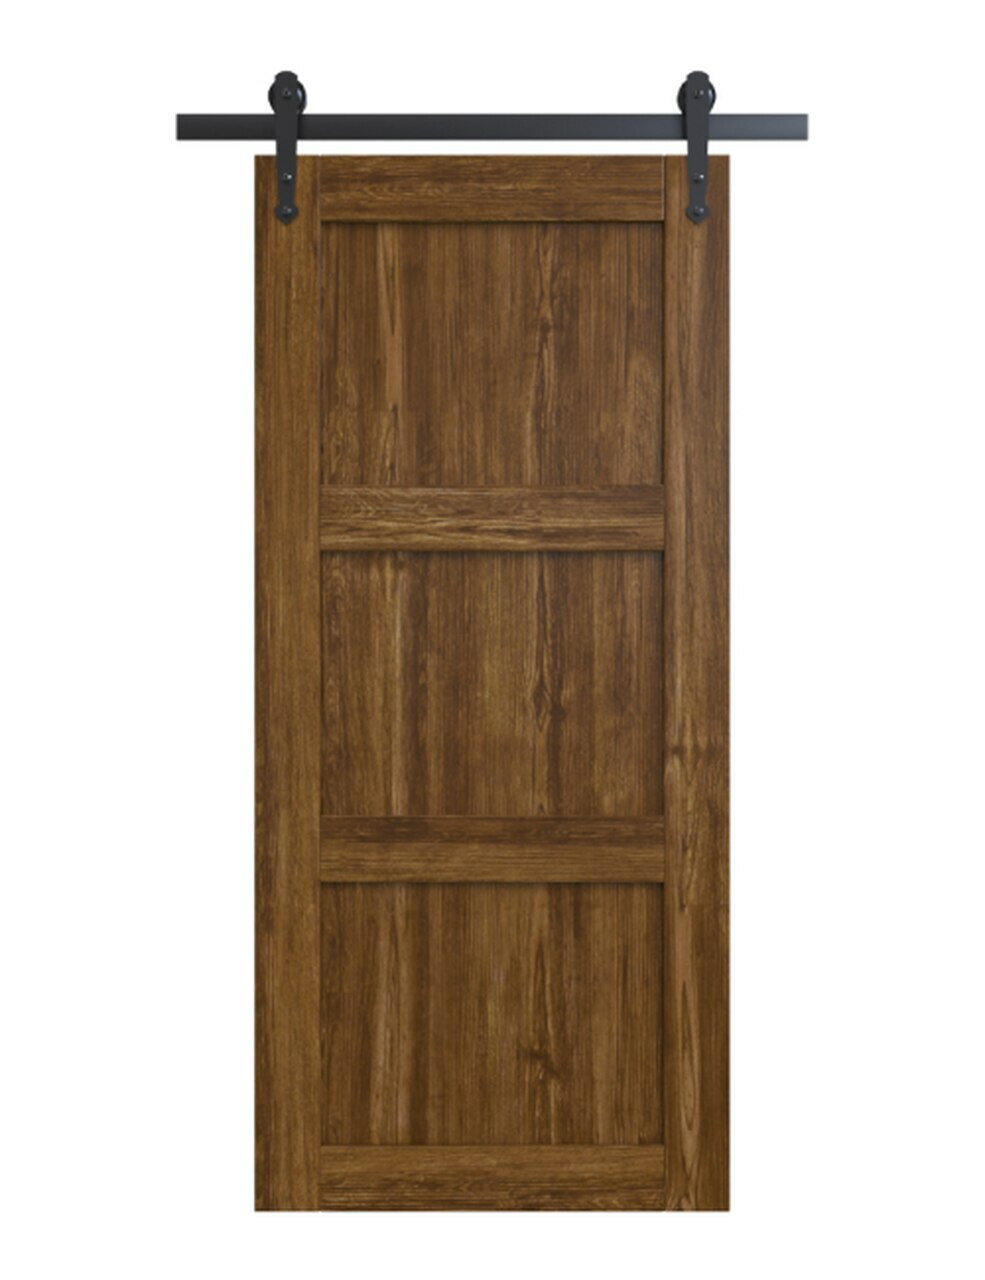 wood medium stain 3 panel shaker barn door